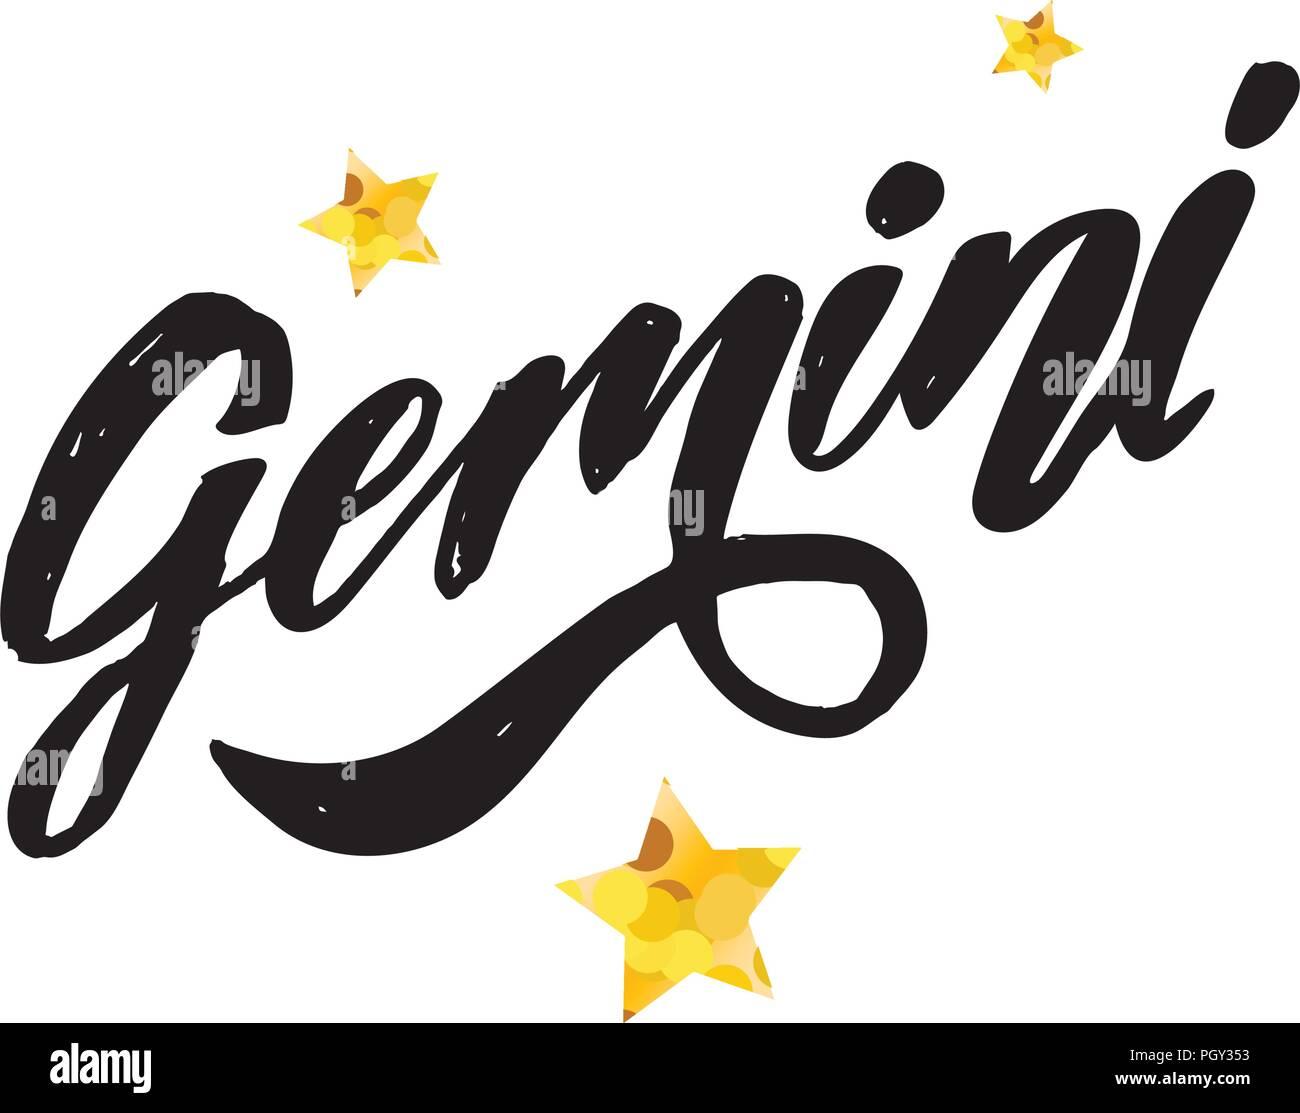 gemini lettering calligraphy brush text horoscope zodiac sign illustration